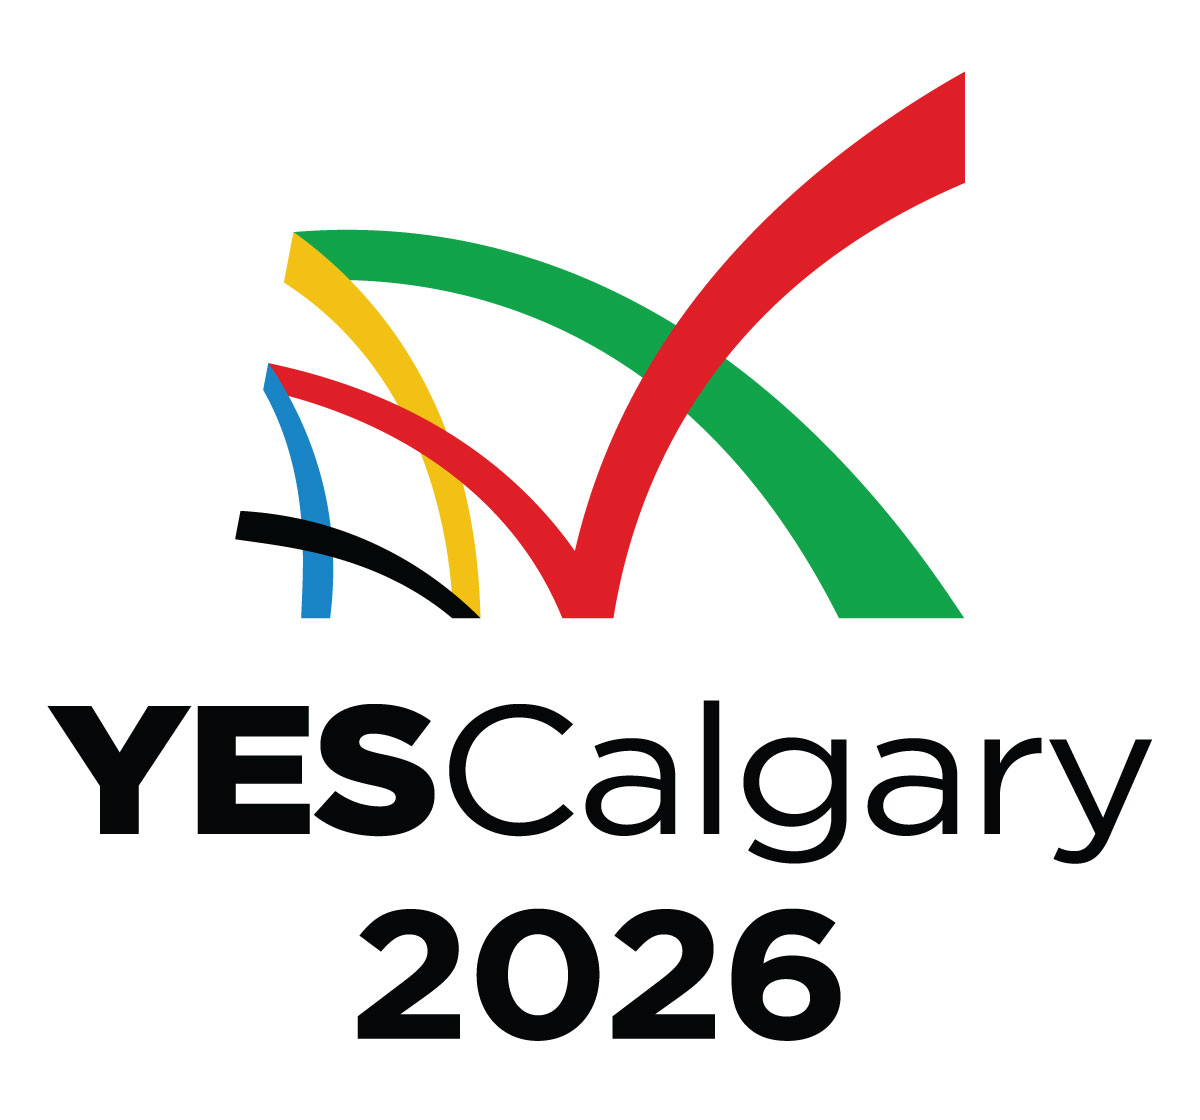 YES Calgary 2026